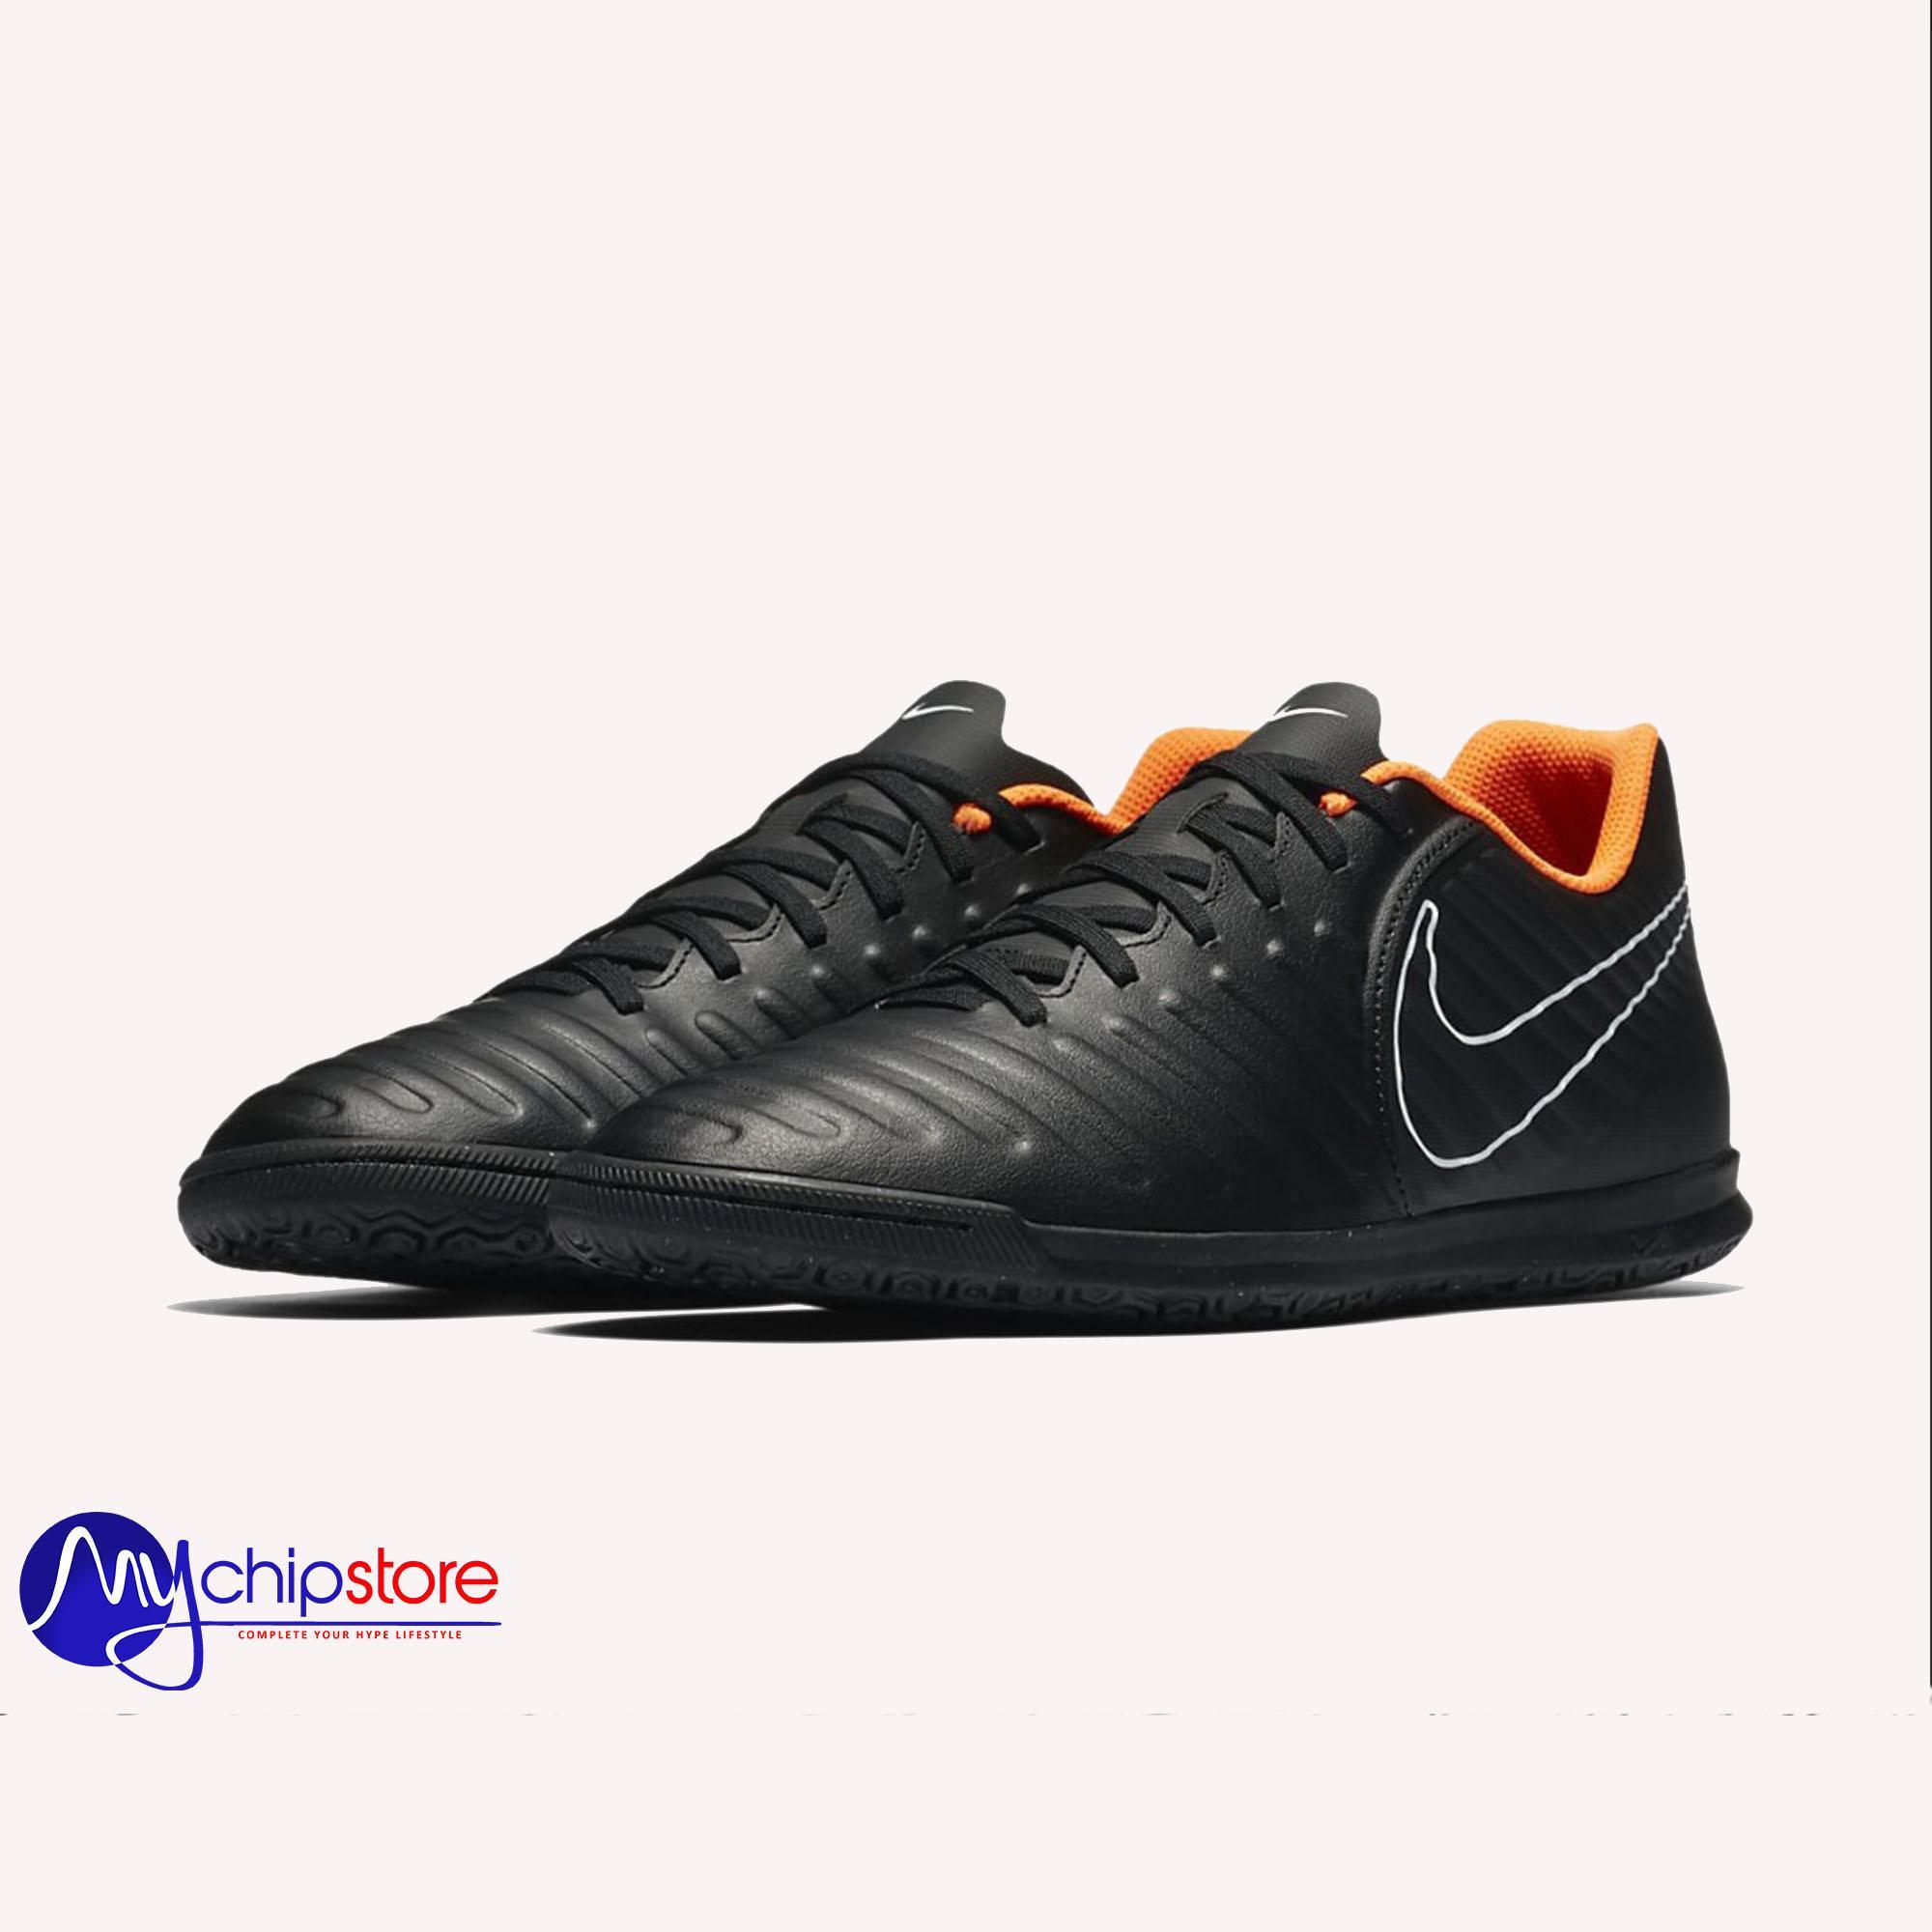 f5f179986 Jual Sepatu Futsal Pria Nike Terbaru